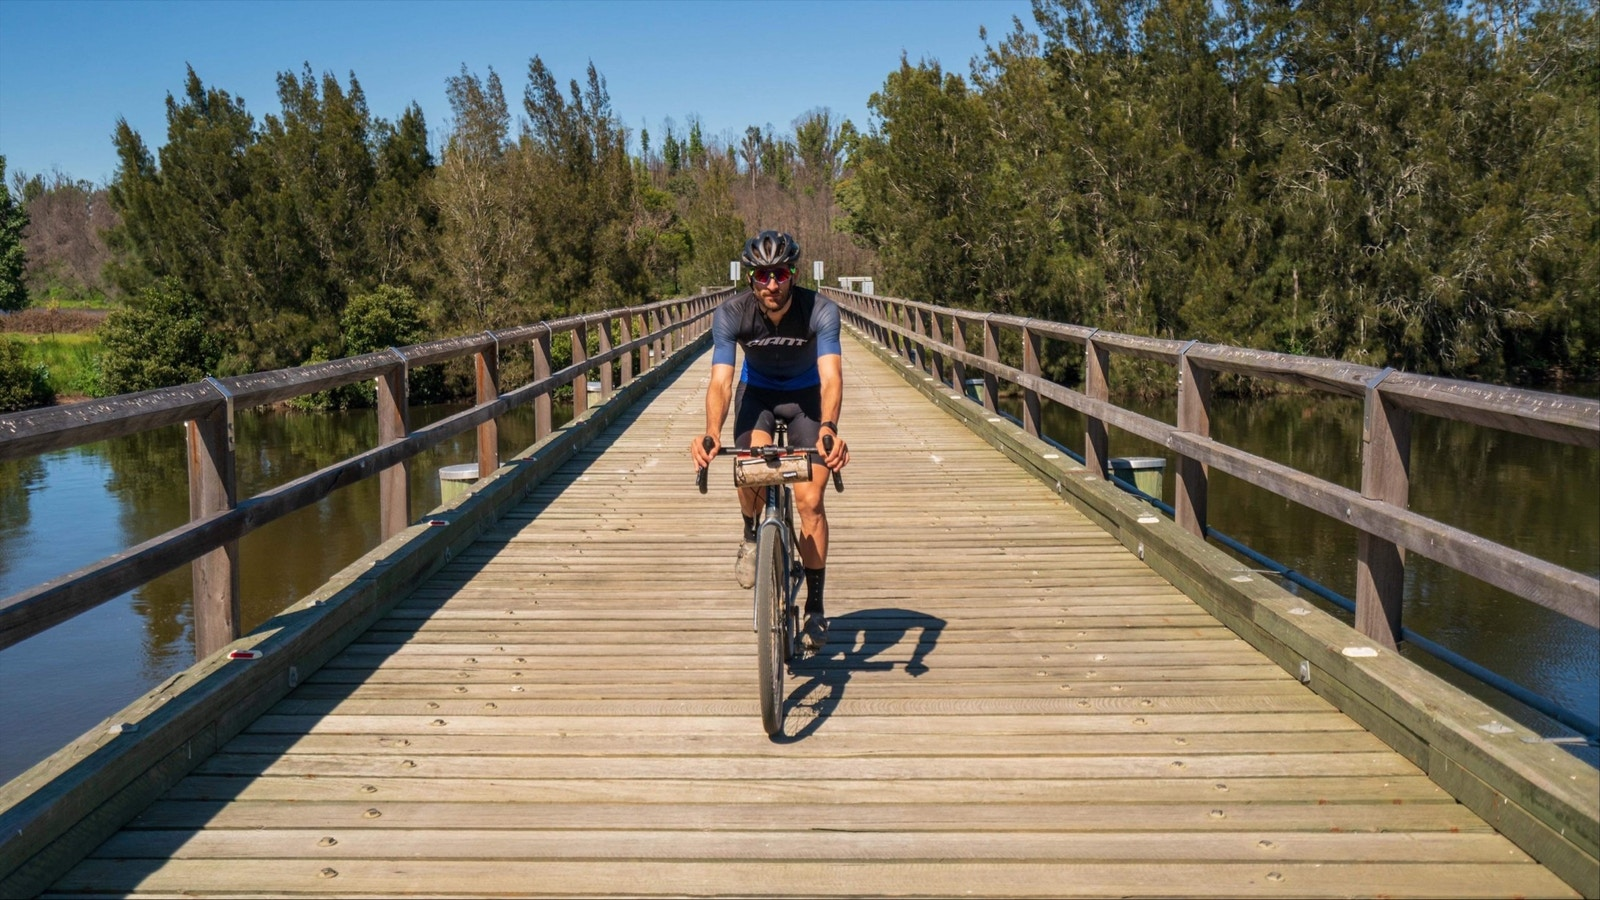 Santini - Thunderbolt Adventure Ride